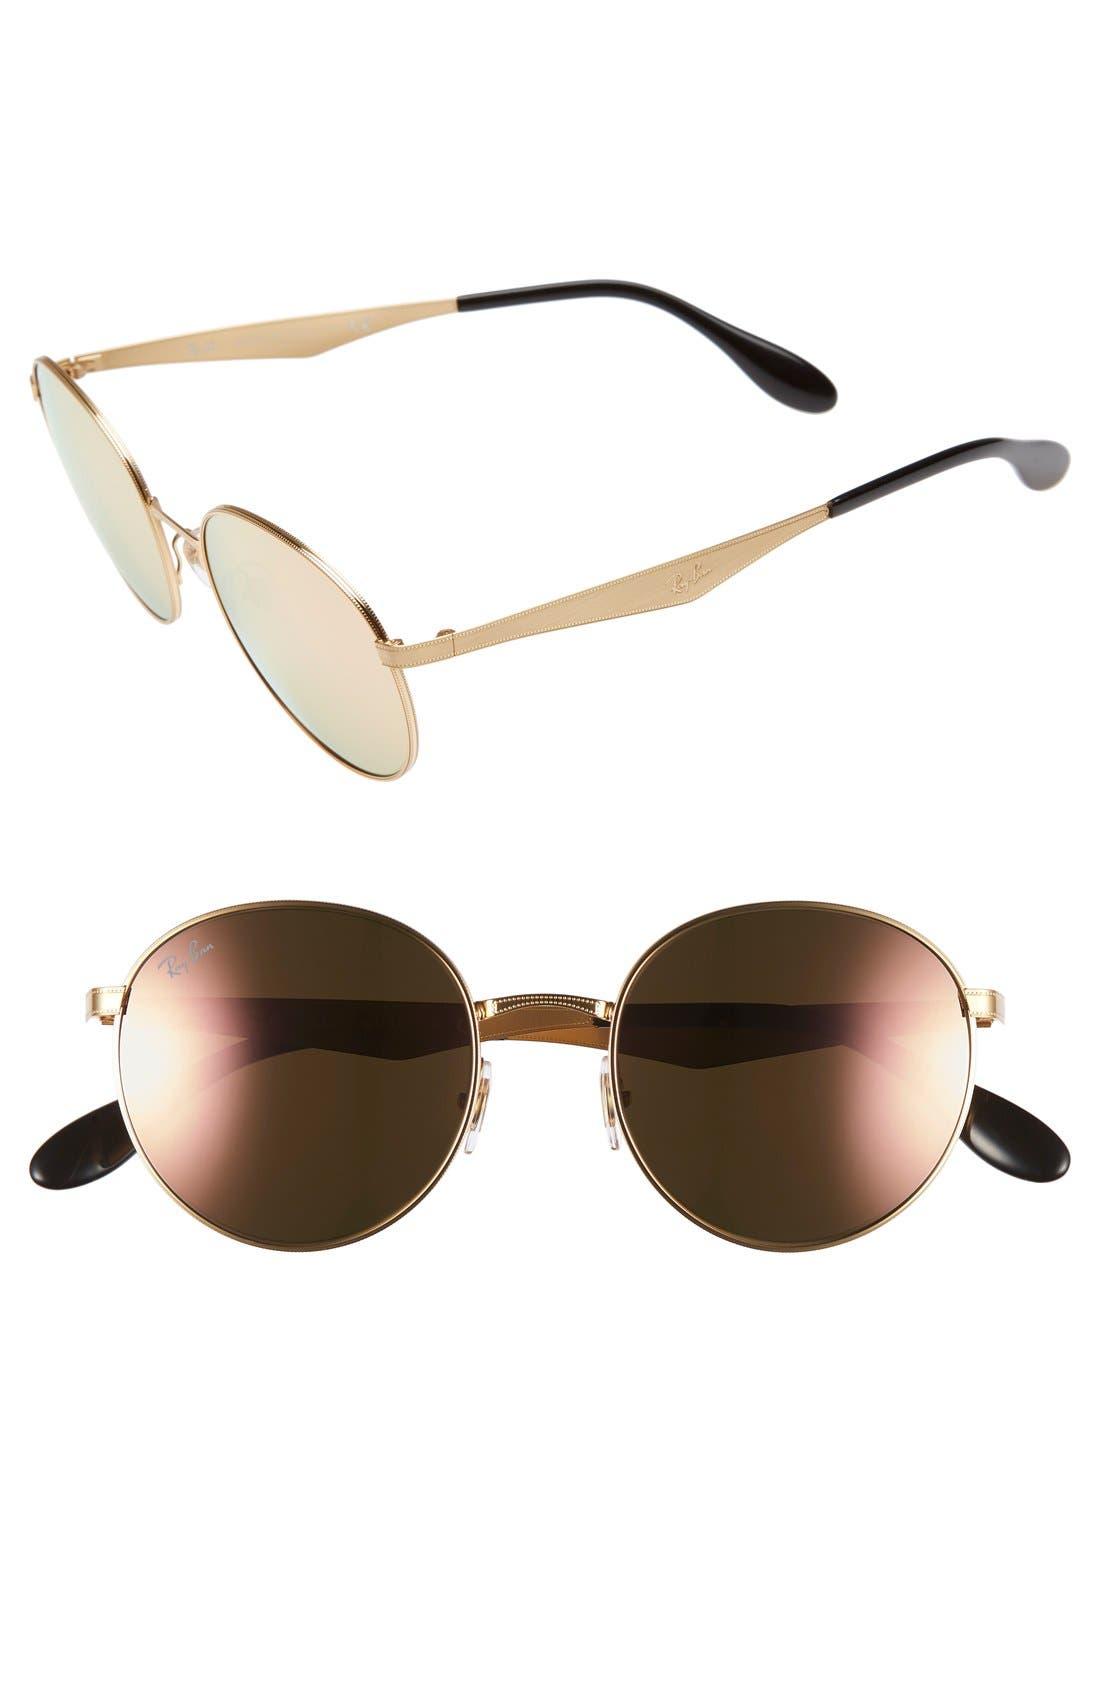 Highstreet 51mm Round Sunglasses,                             Main thumbnail 1, color,                             706